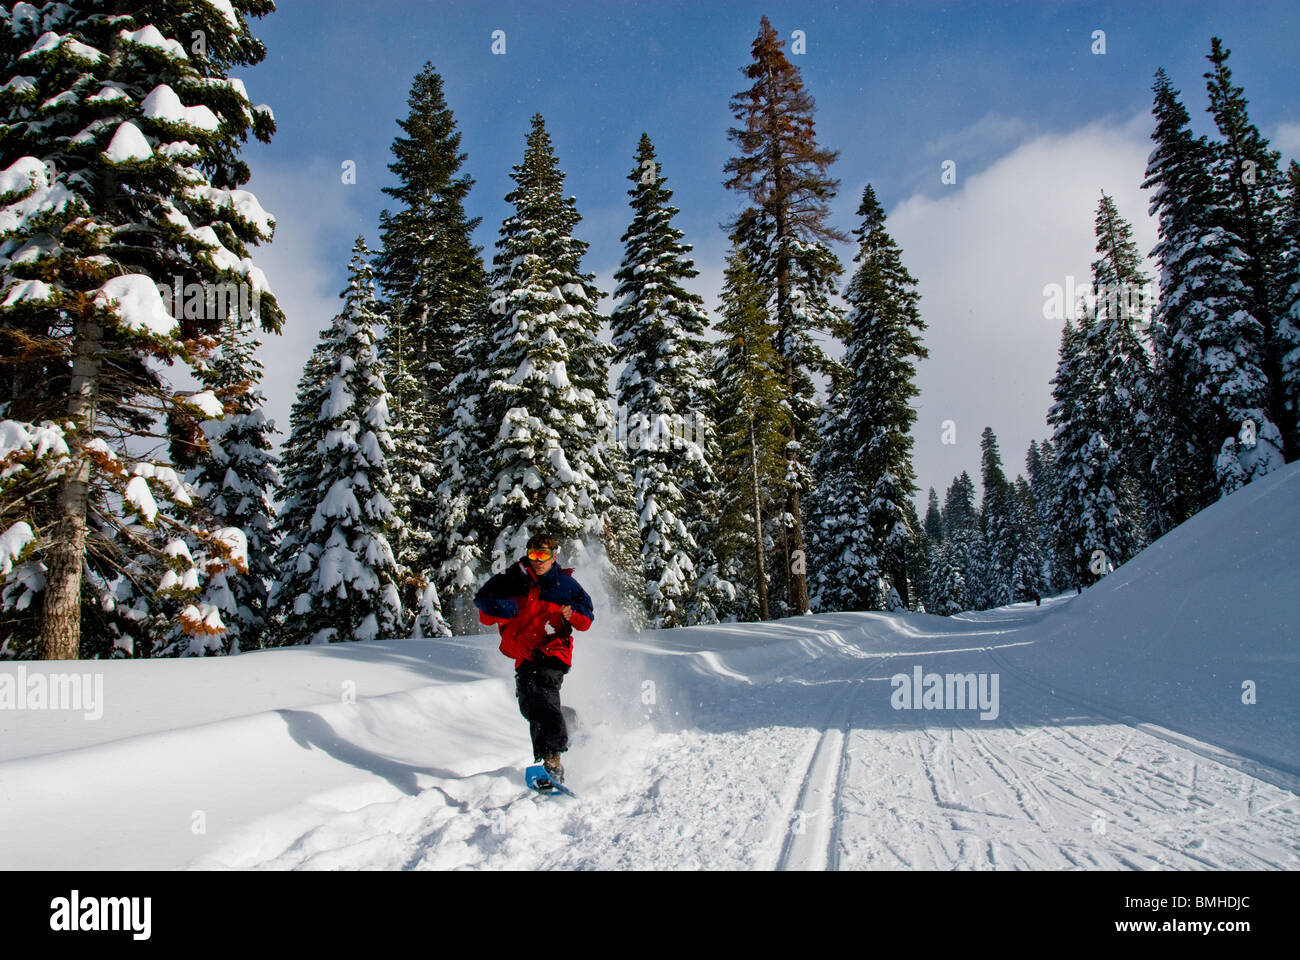 snowshoes, sport, Winter scene, North Lake Tahoe, California, USA Stock Photo